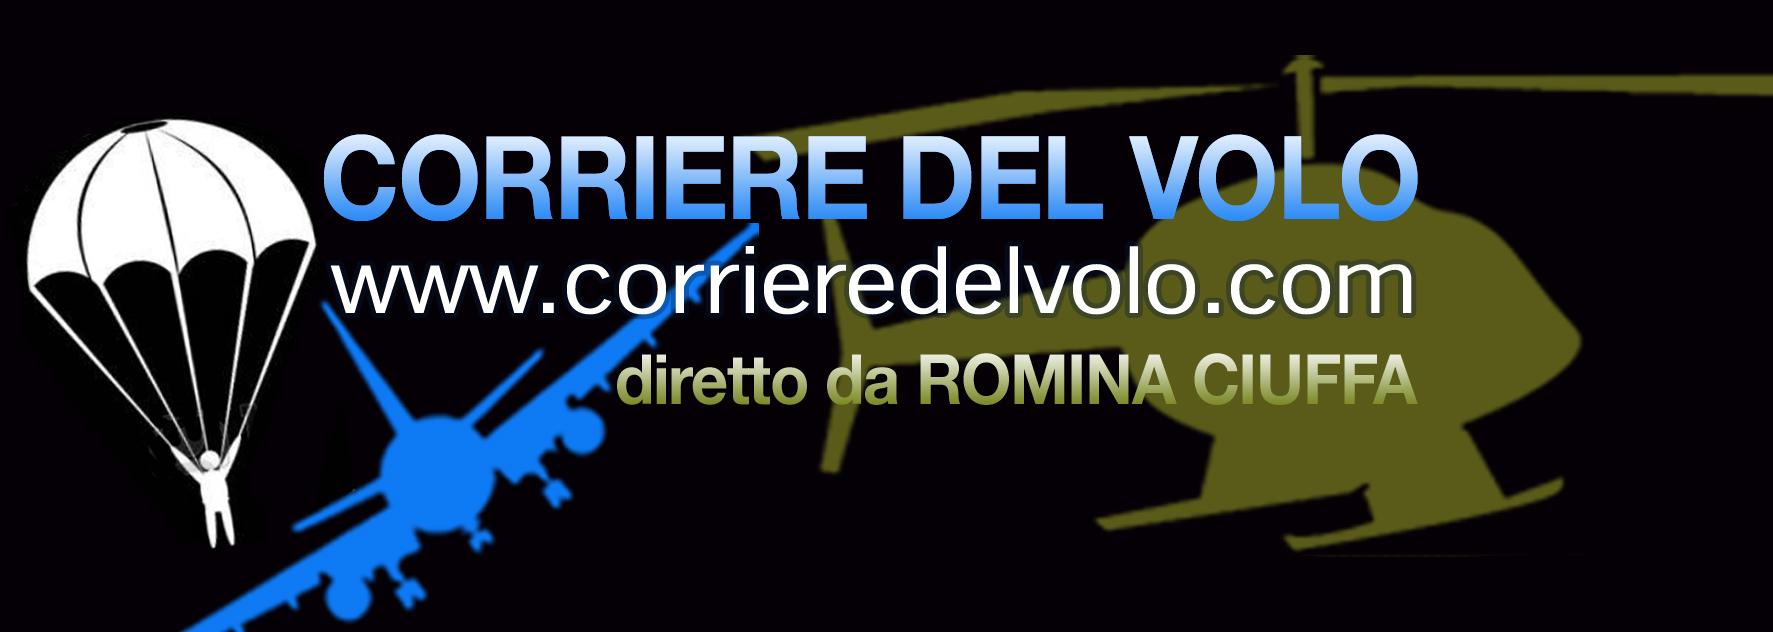 www.corrieredelvolo.com